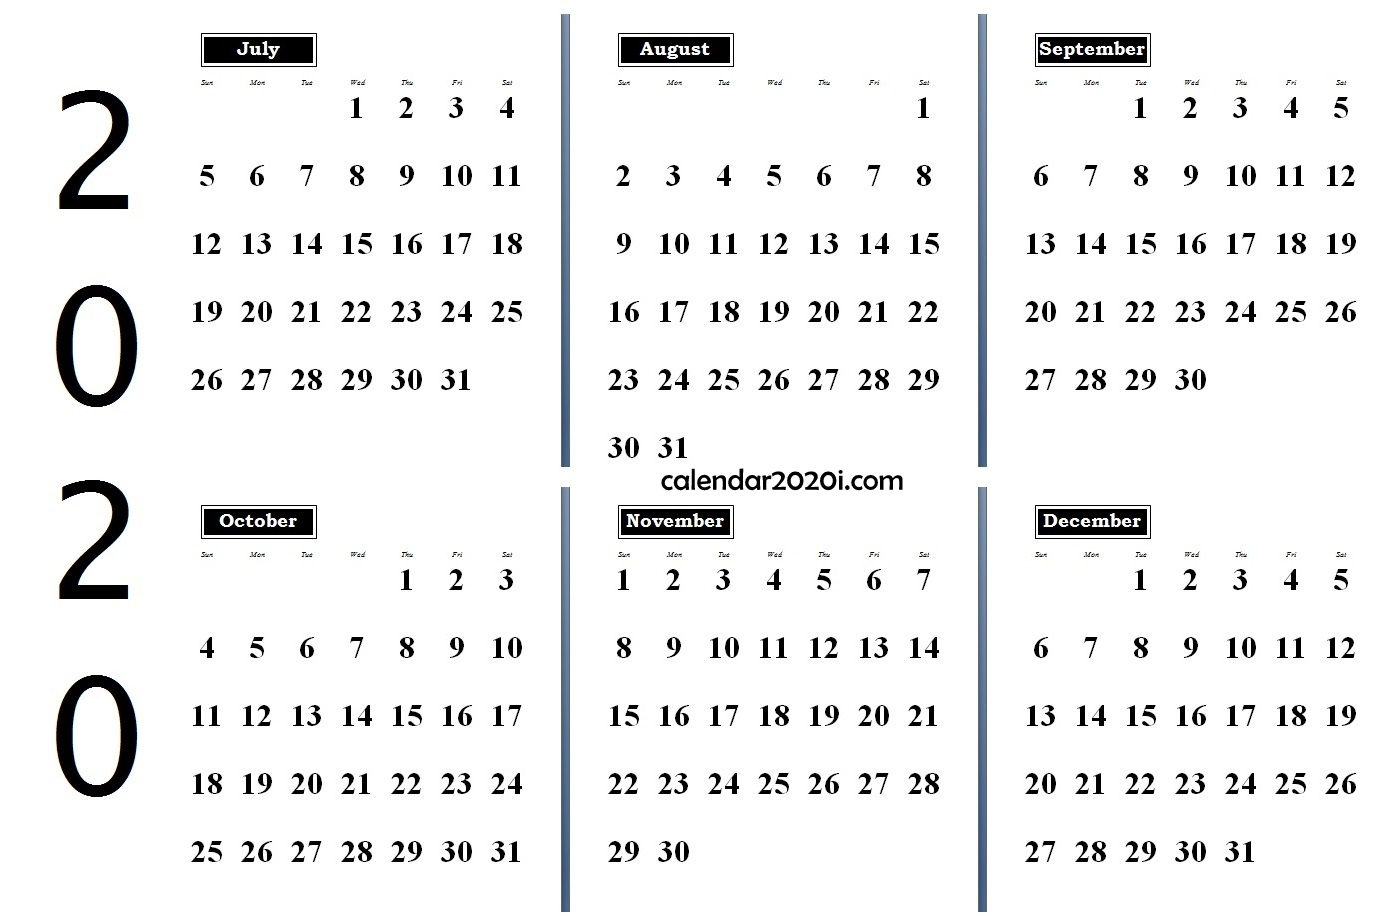 6 Months 2020 Half Year Printable Calendar | Calendar 2020 within Half-Page Yearly Callendar